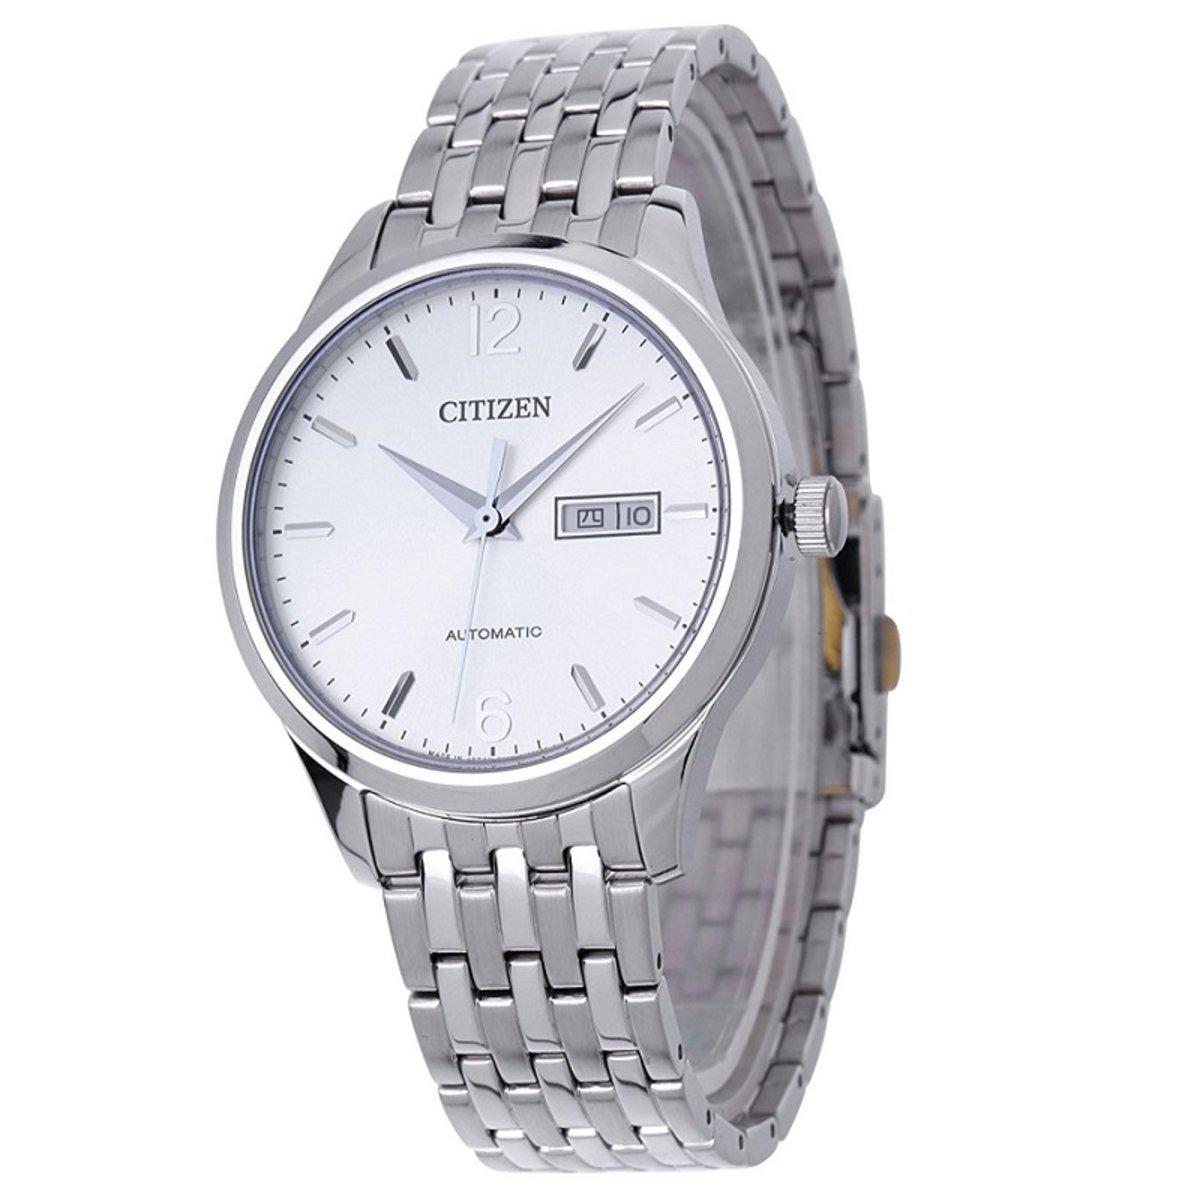 Citizen 男士機械手錶 NH7500-53A 平行進口